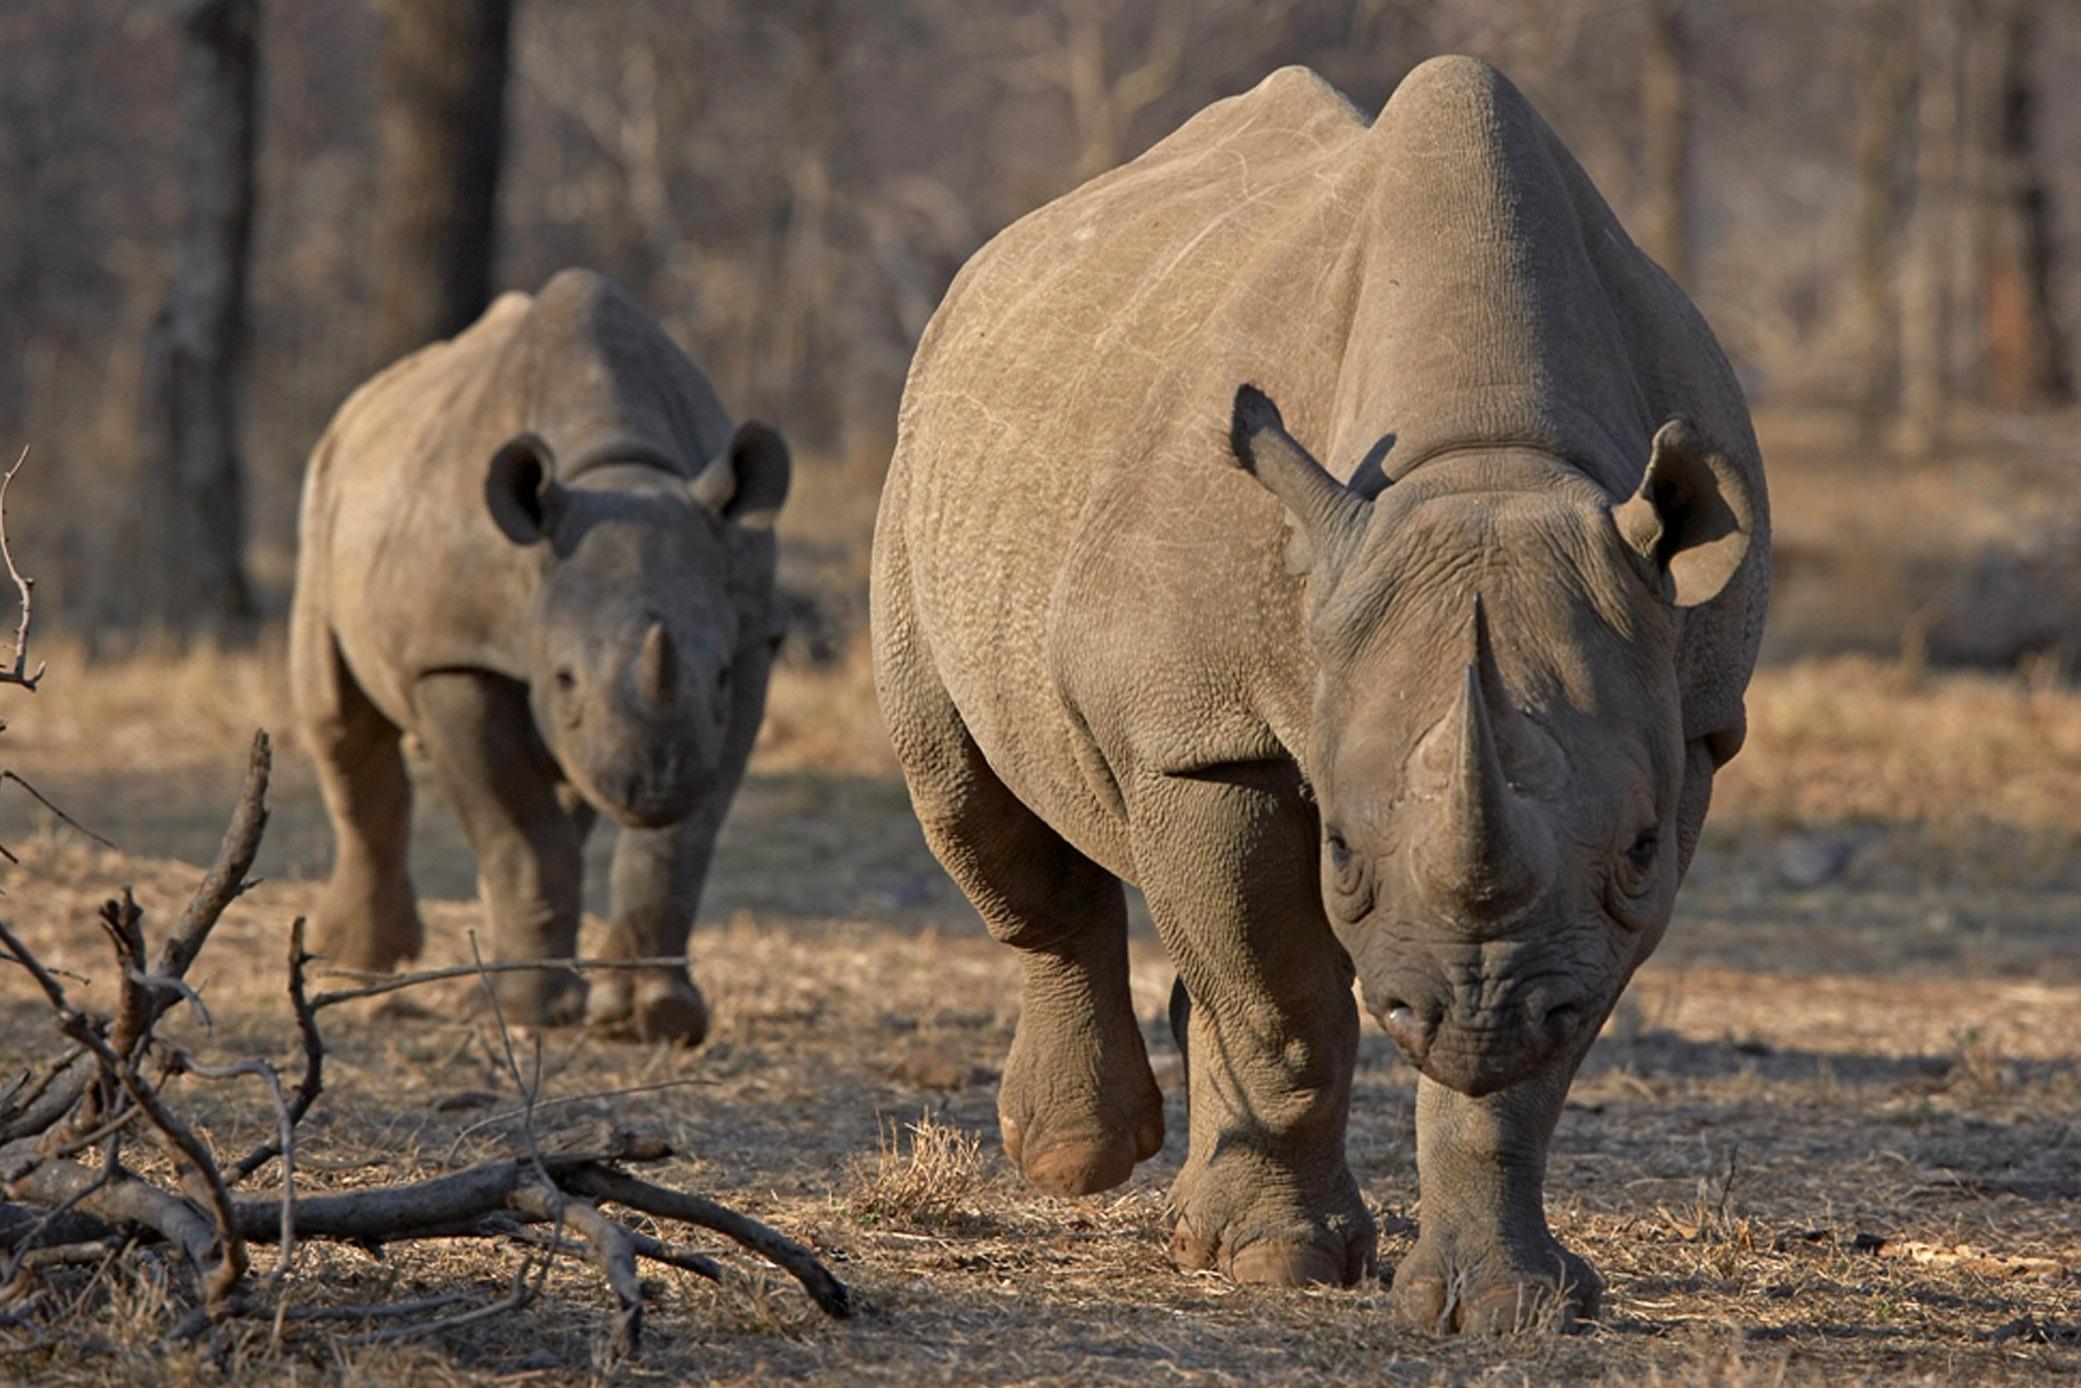 Image: An endangered east African black rhino